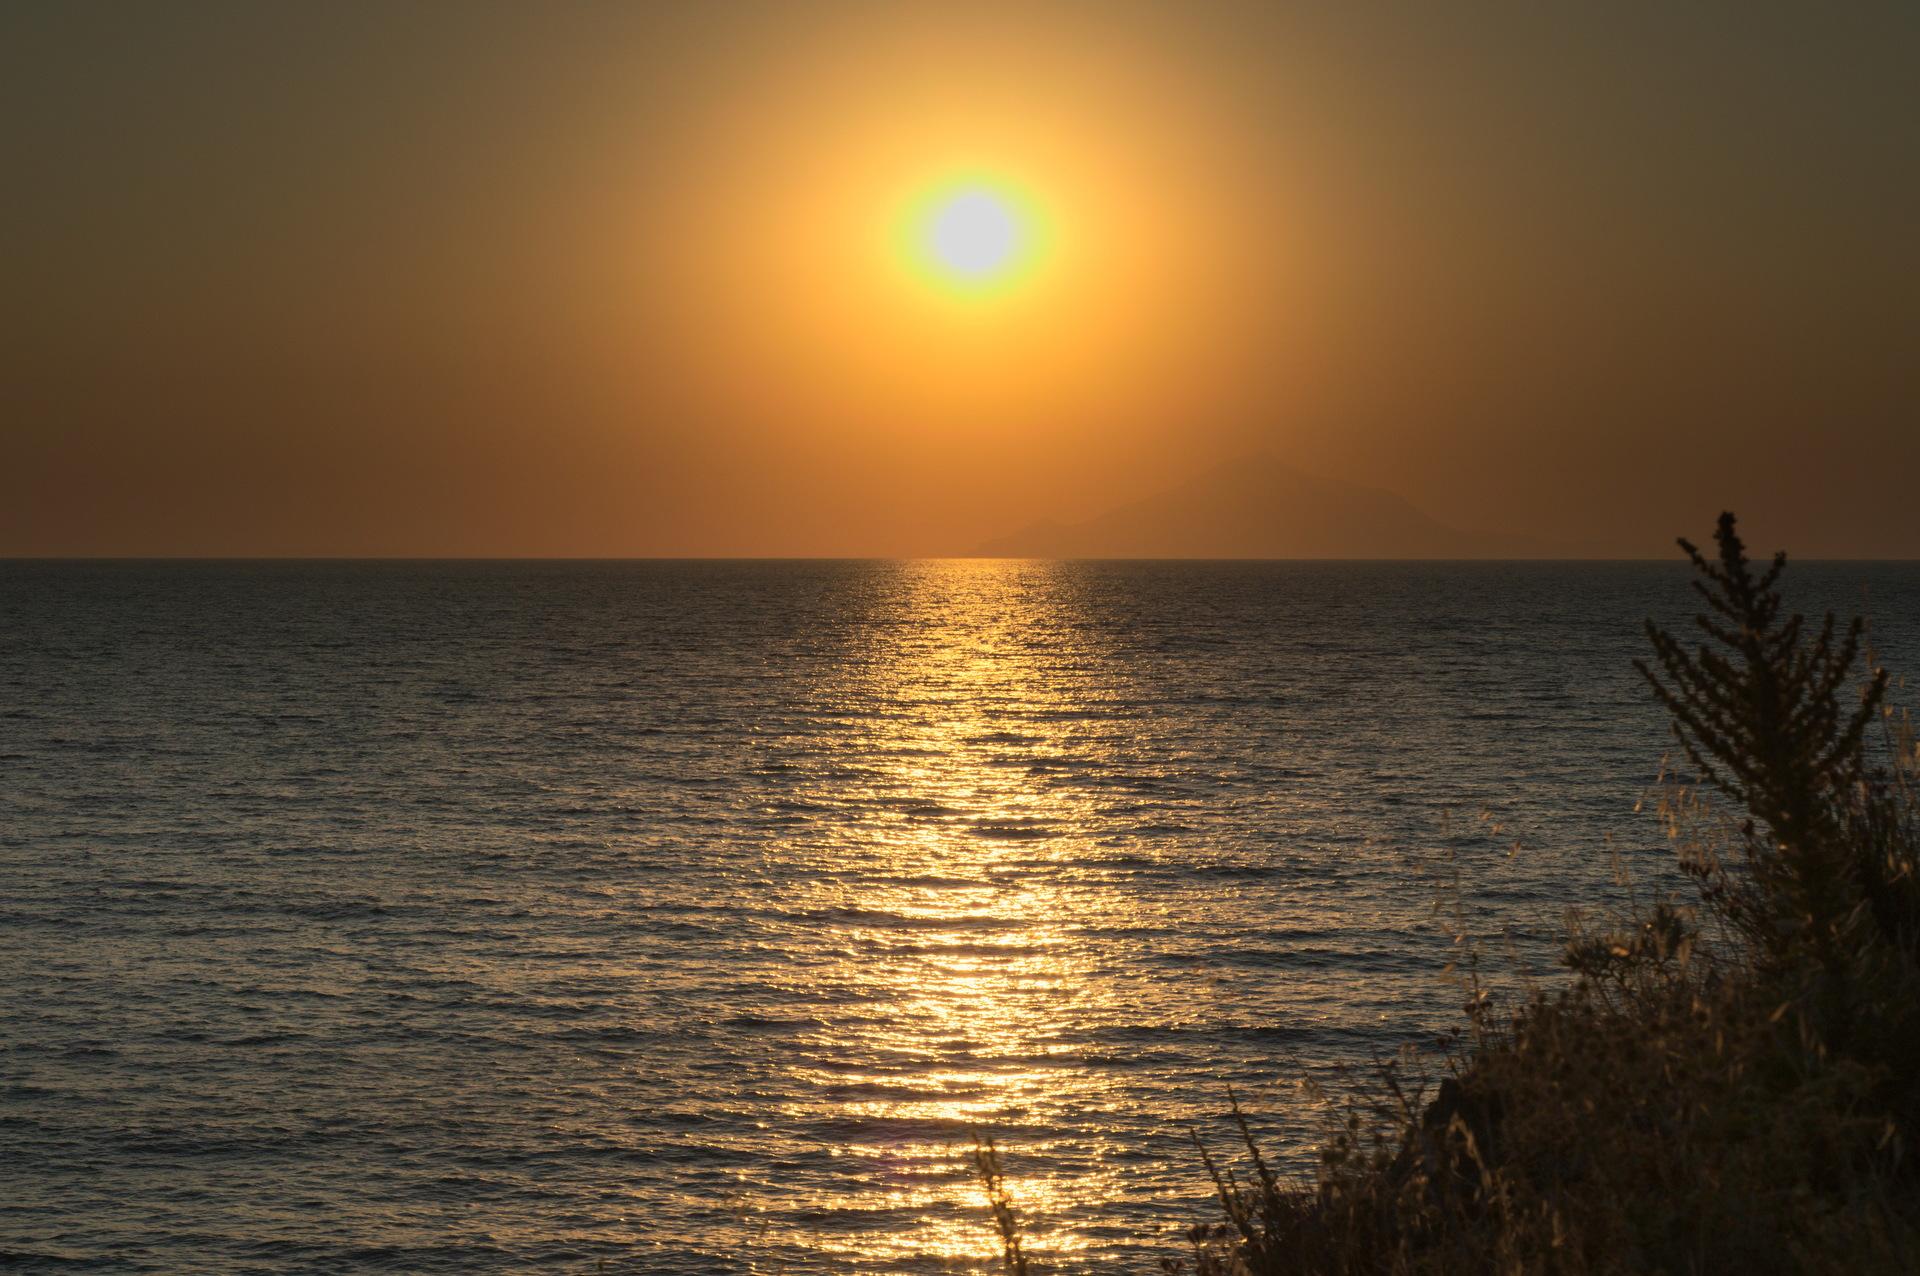 Sunset in Lemnos (Greece | dimitris1268, sunset, sun, beach